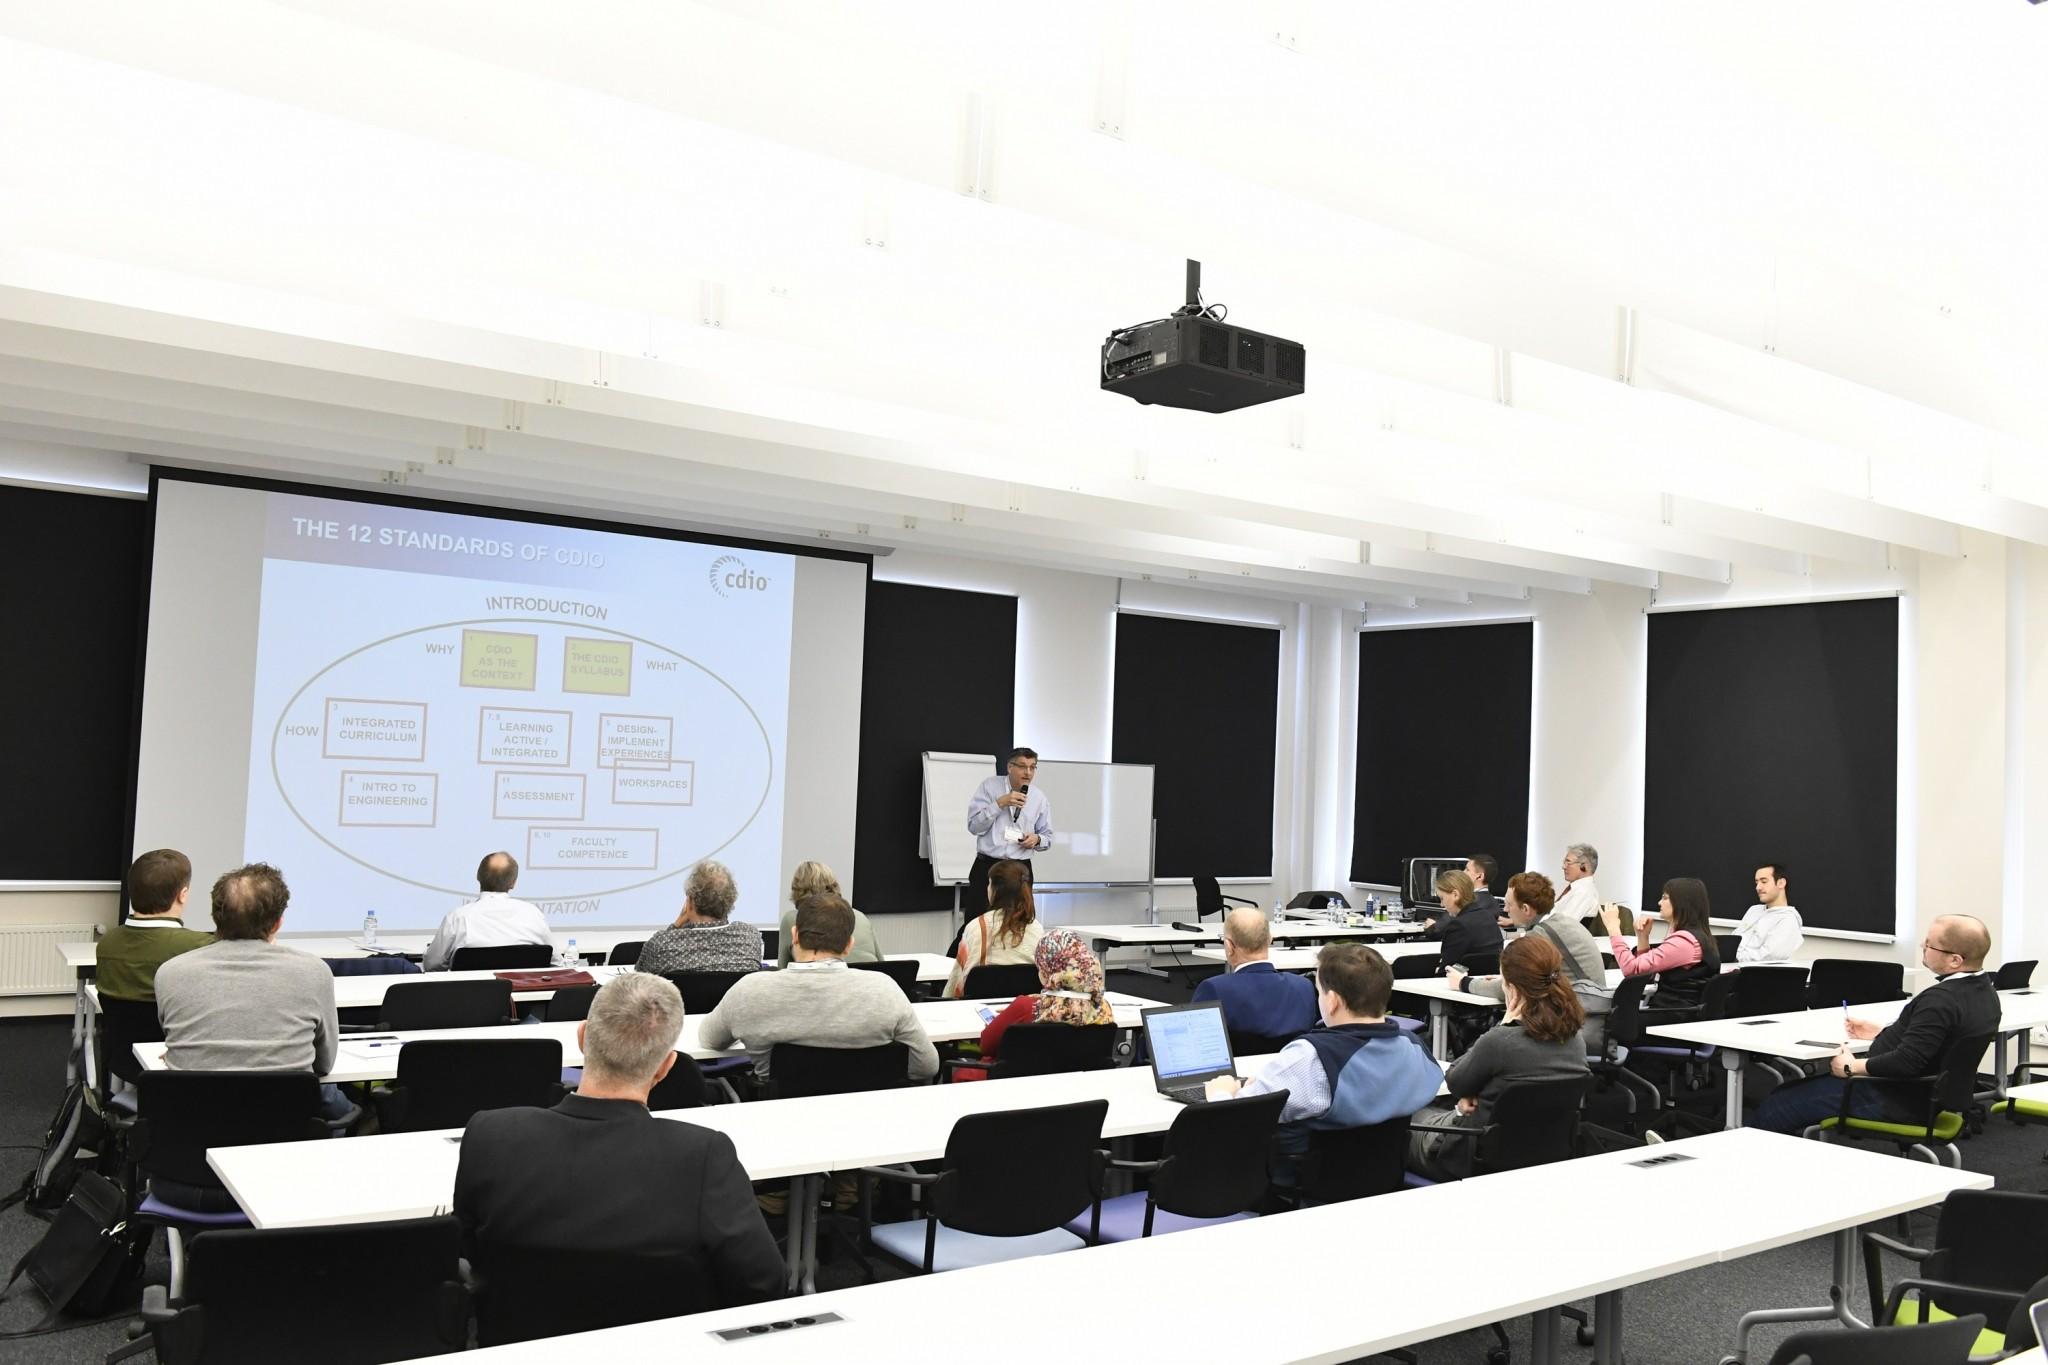 Professor Ron Hugo delivers a presentation on the 12 standards. Photo: Skoltech.